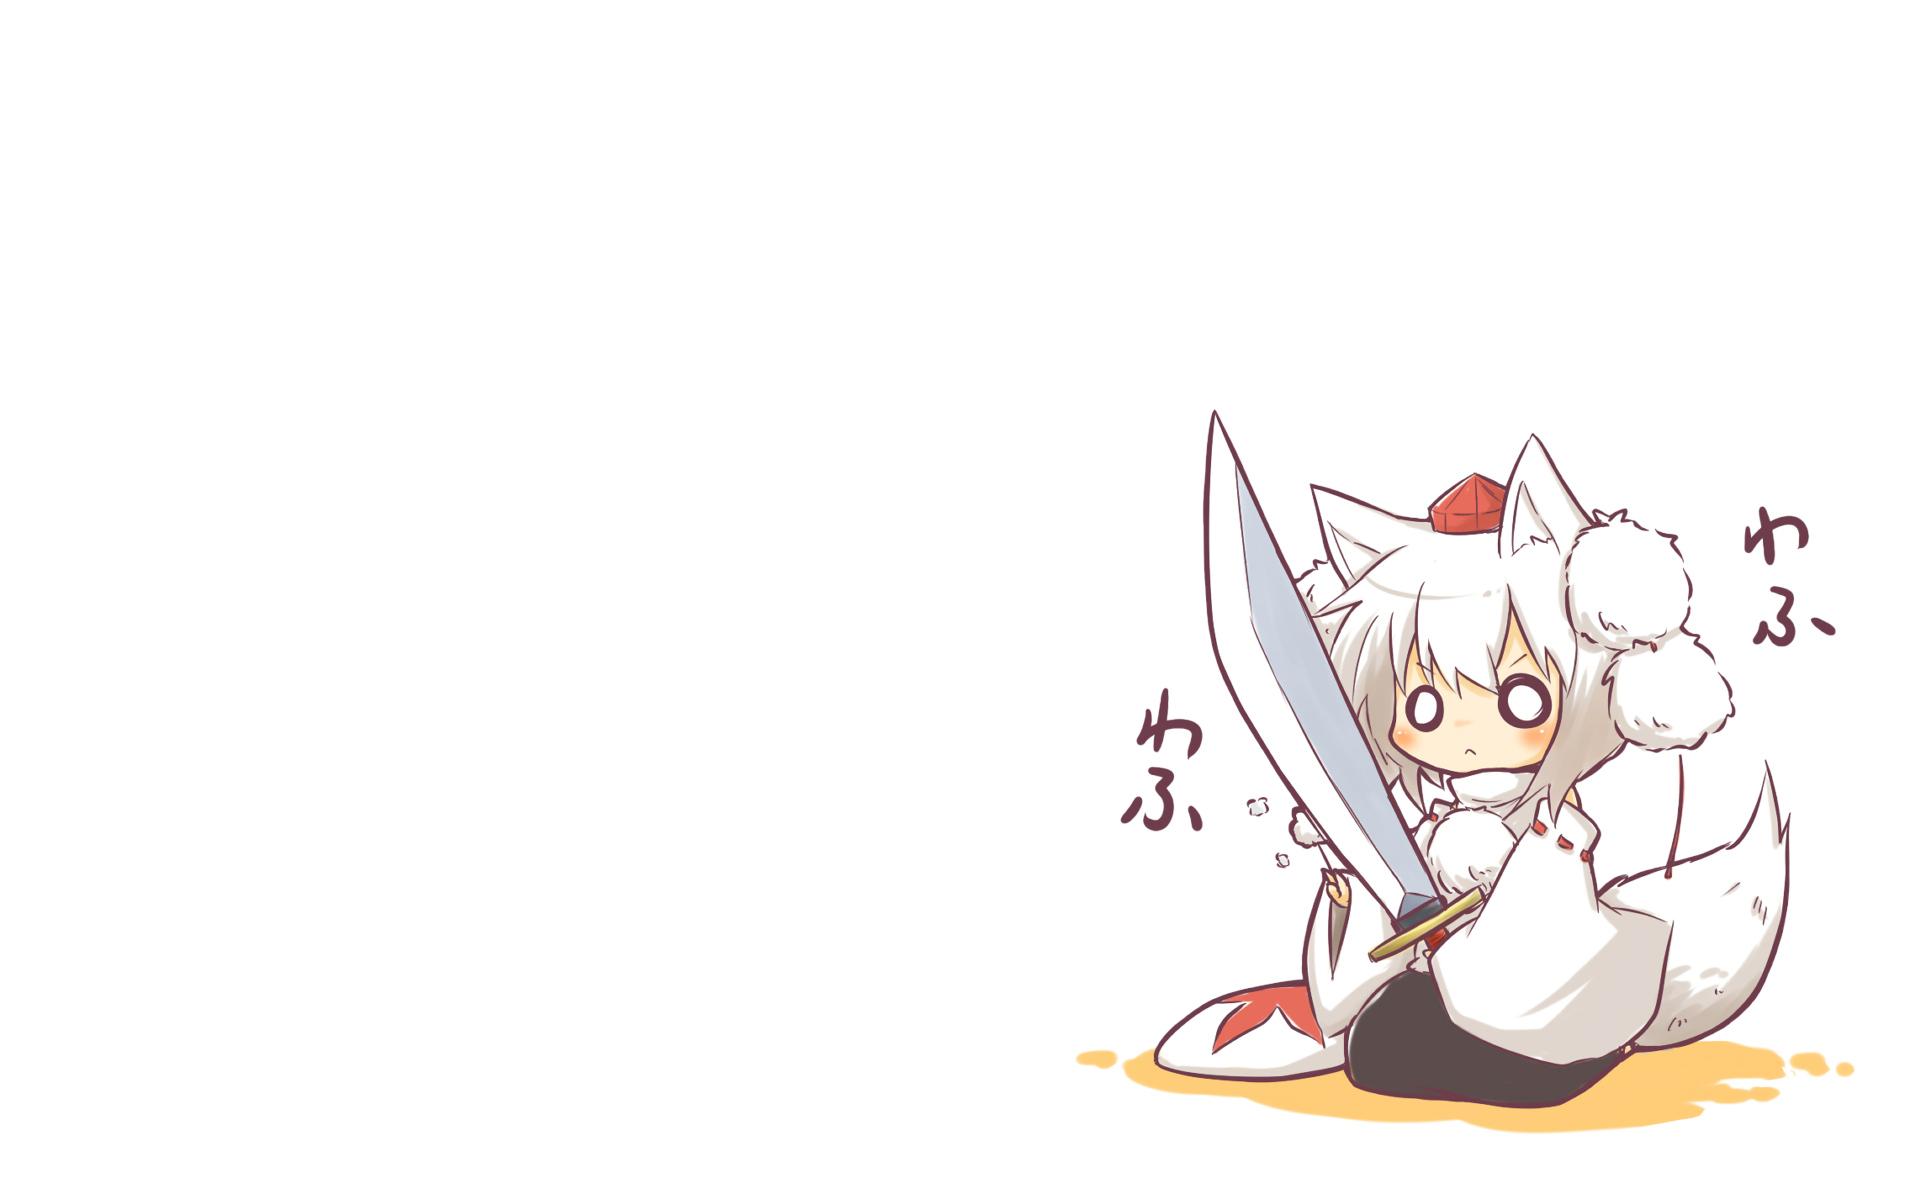 animal_ears chibi hat inubashiri_momiji sword tail touhou viva!! weapon wolfgirl